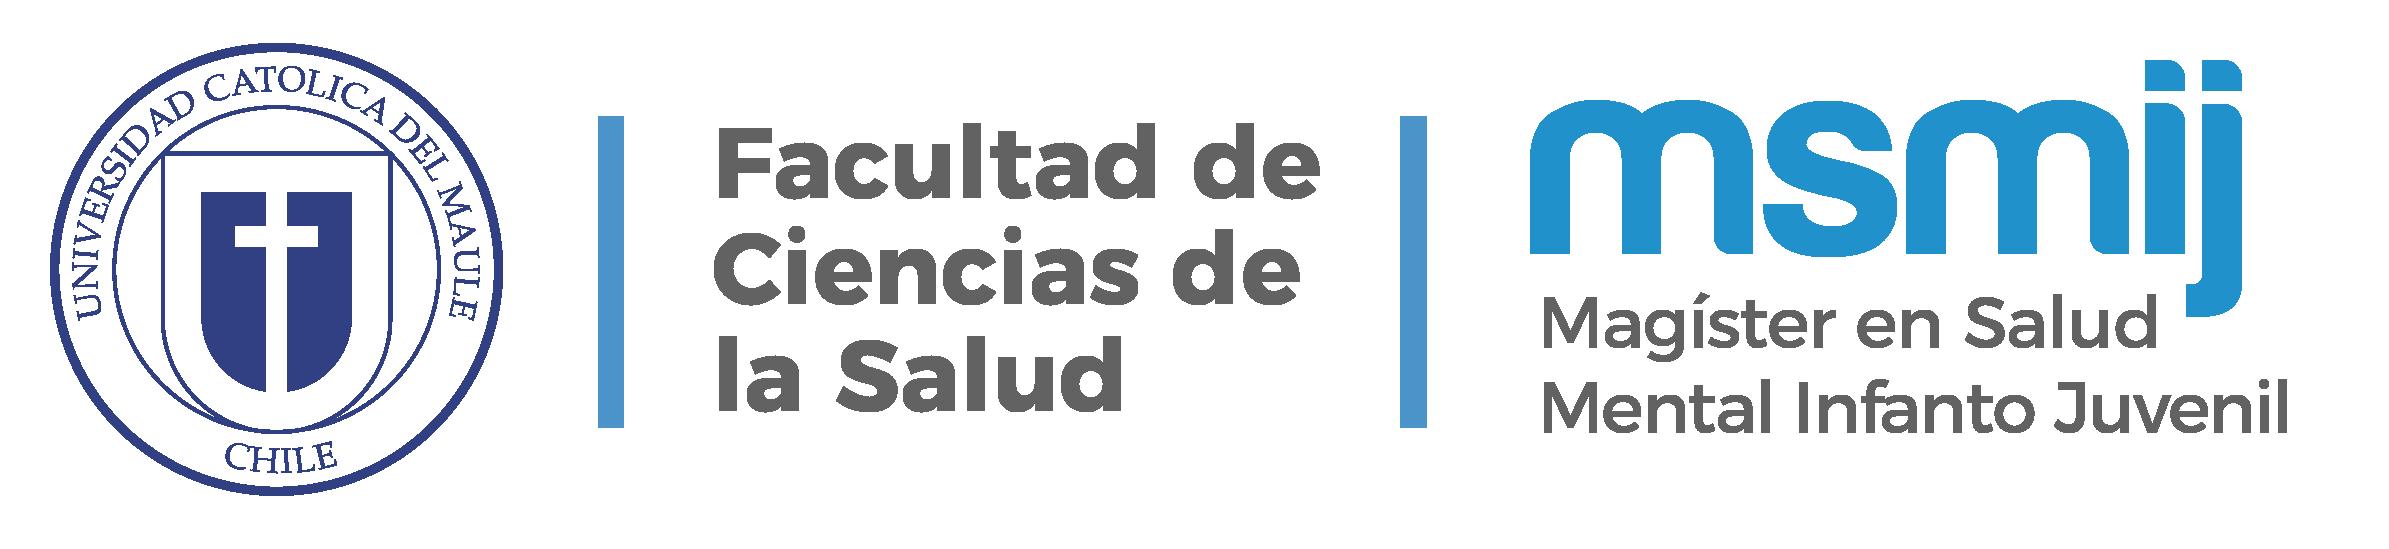 logo_mg_salud_mental_infanto_juvenil